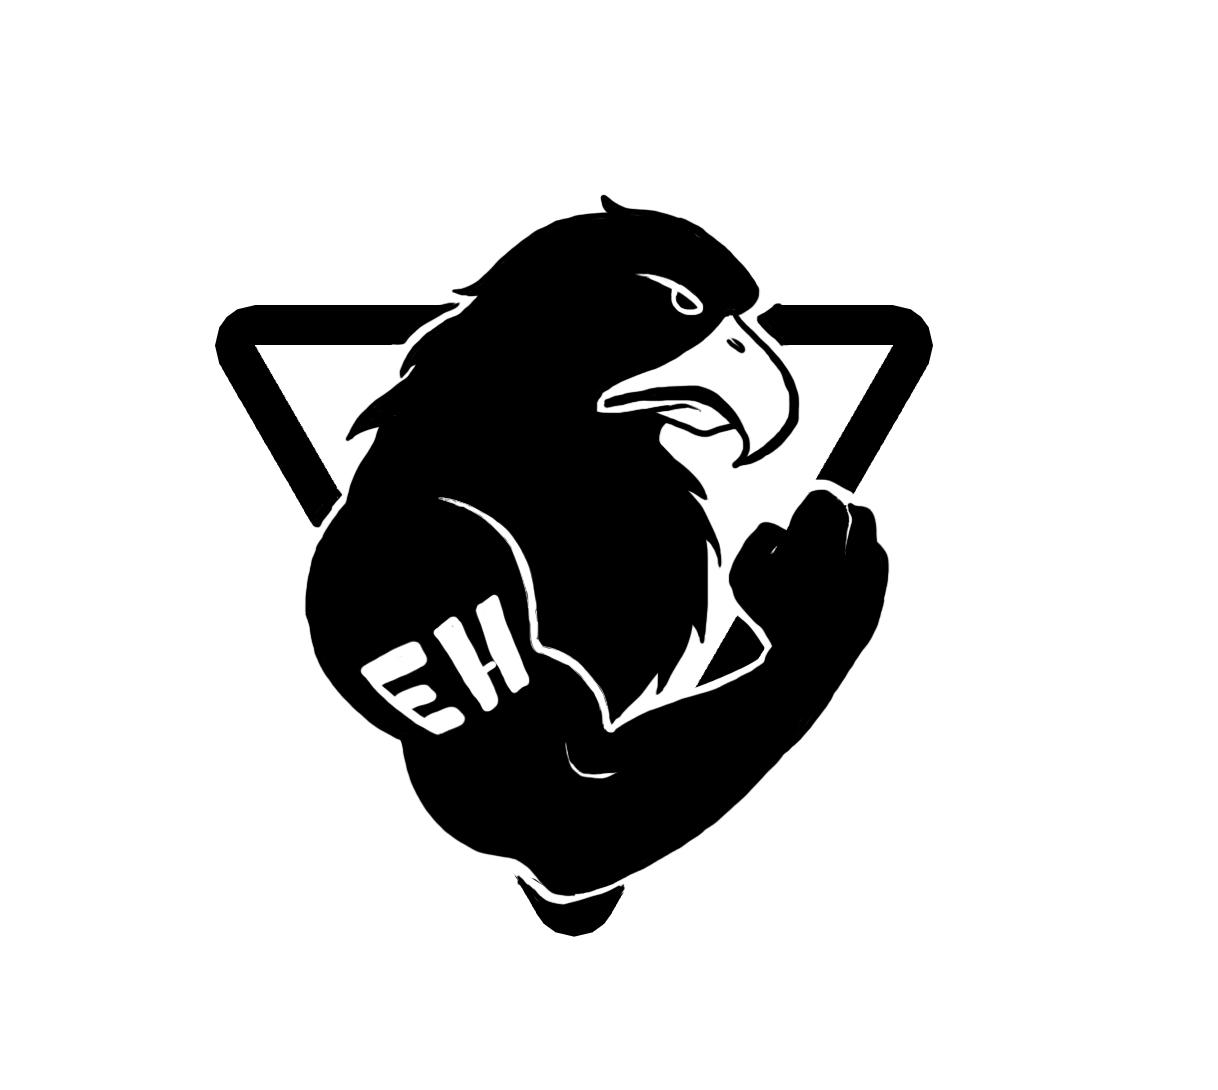 Легион логотип картинки